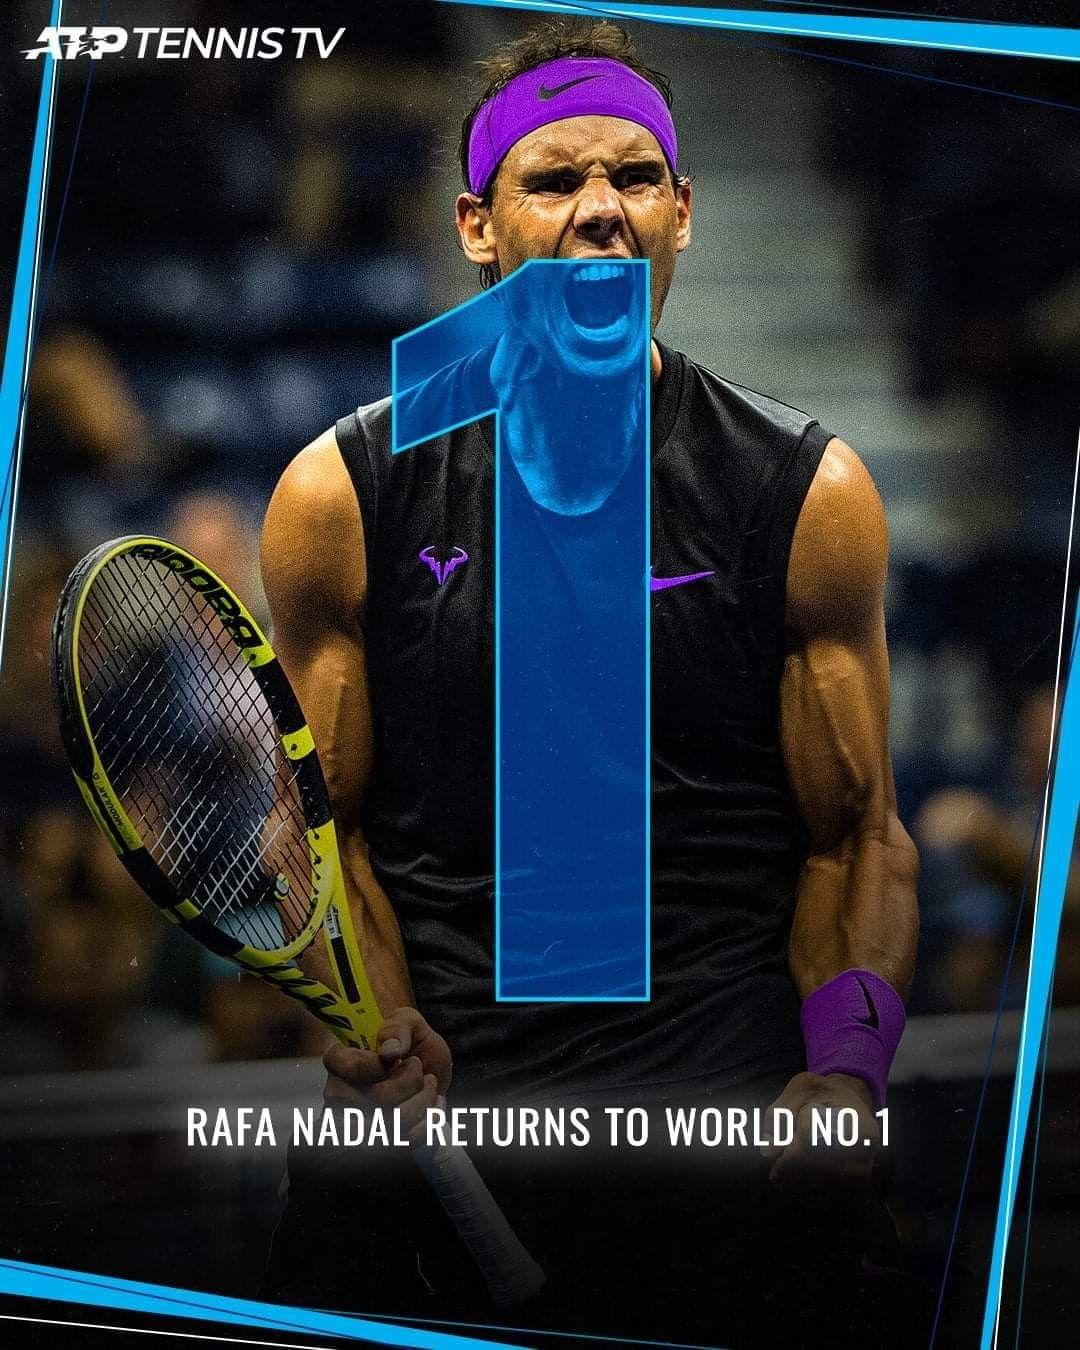 11 4 2019 Tennis Art Rafa Nadal Rafael Nadal